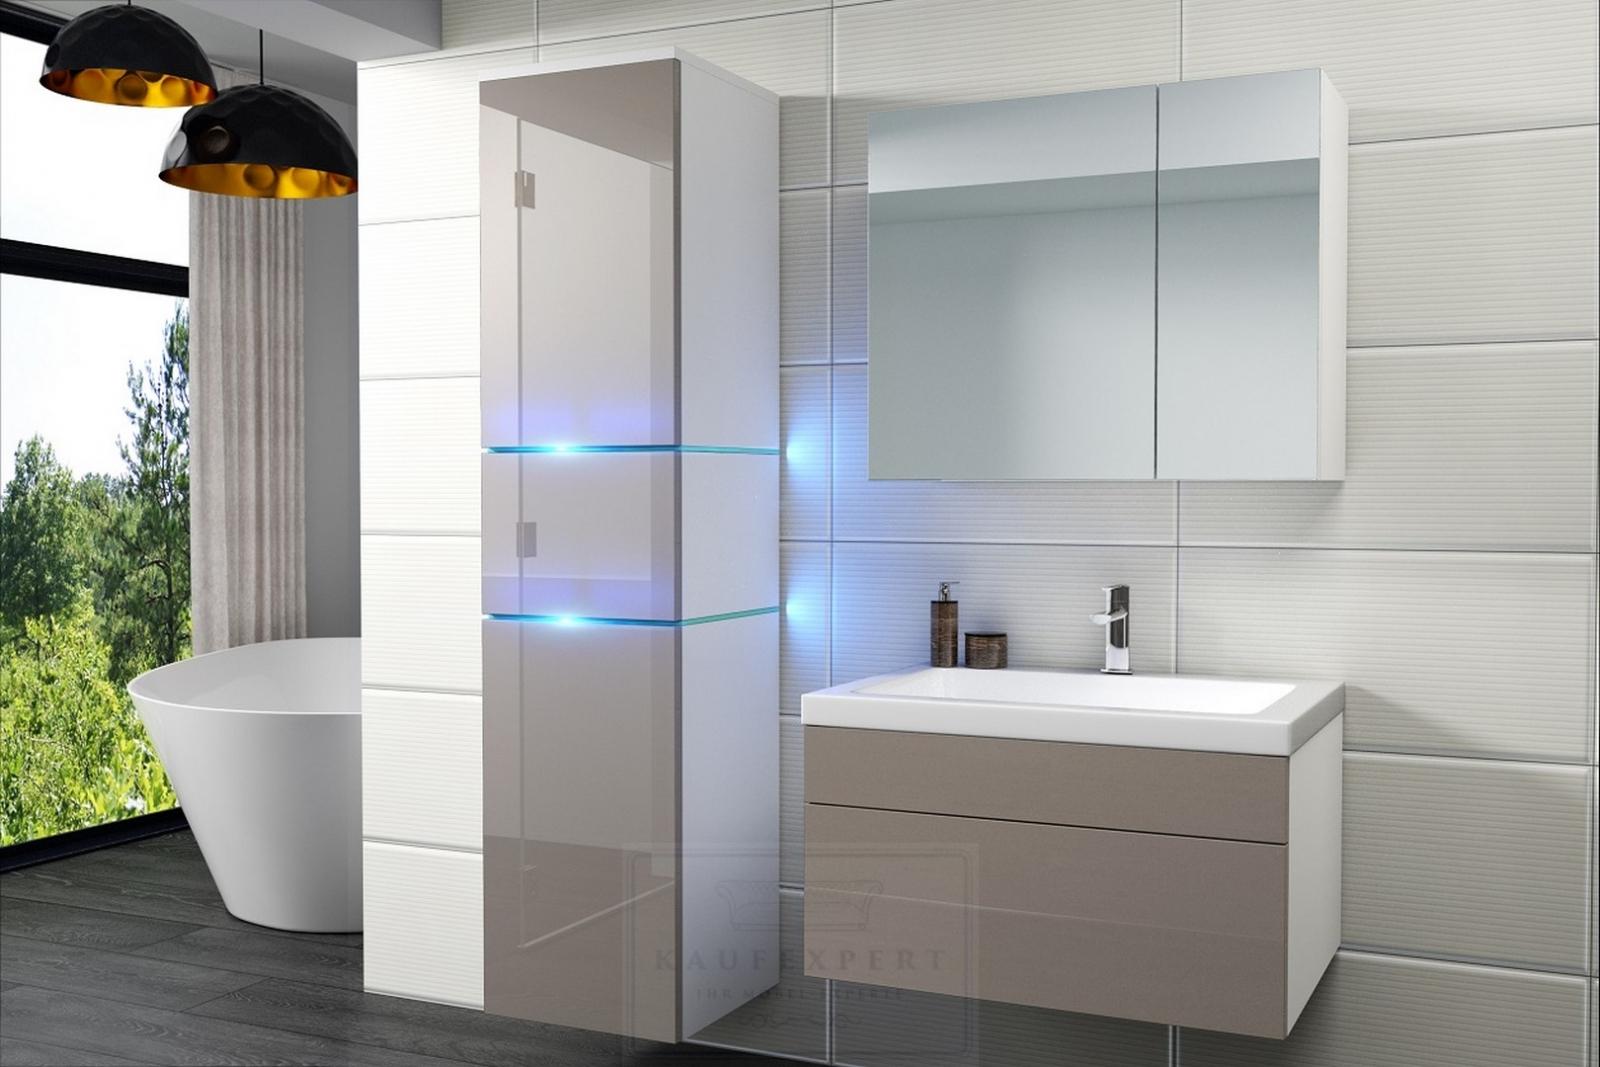 kaufexpert badm bel set ledox 170 cm cappuccino hochglanz wei keramik waschbecken badezimmer. Black Bedroom Furniture Sets. Home Design Ideas